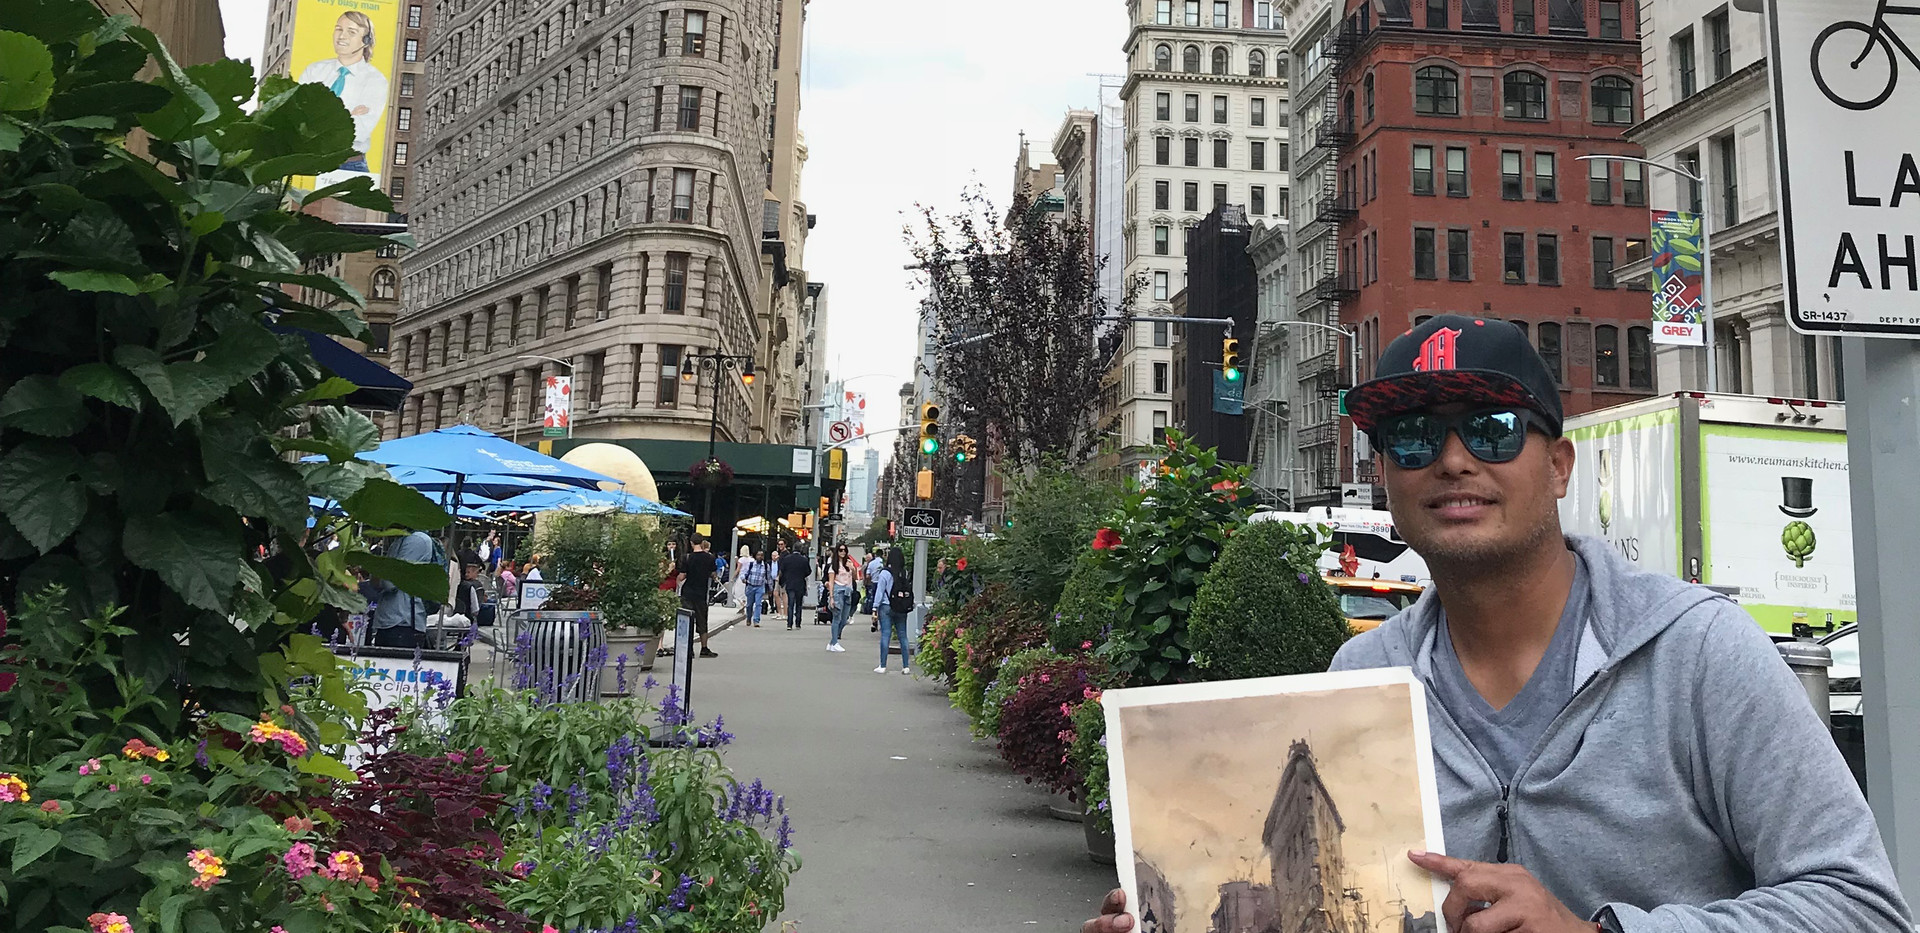 Noon time at Flatiron area lower Manhattan,